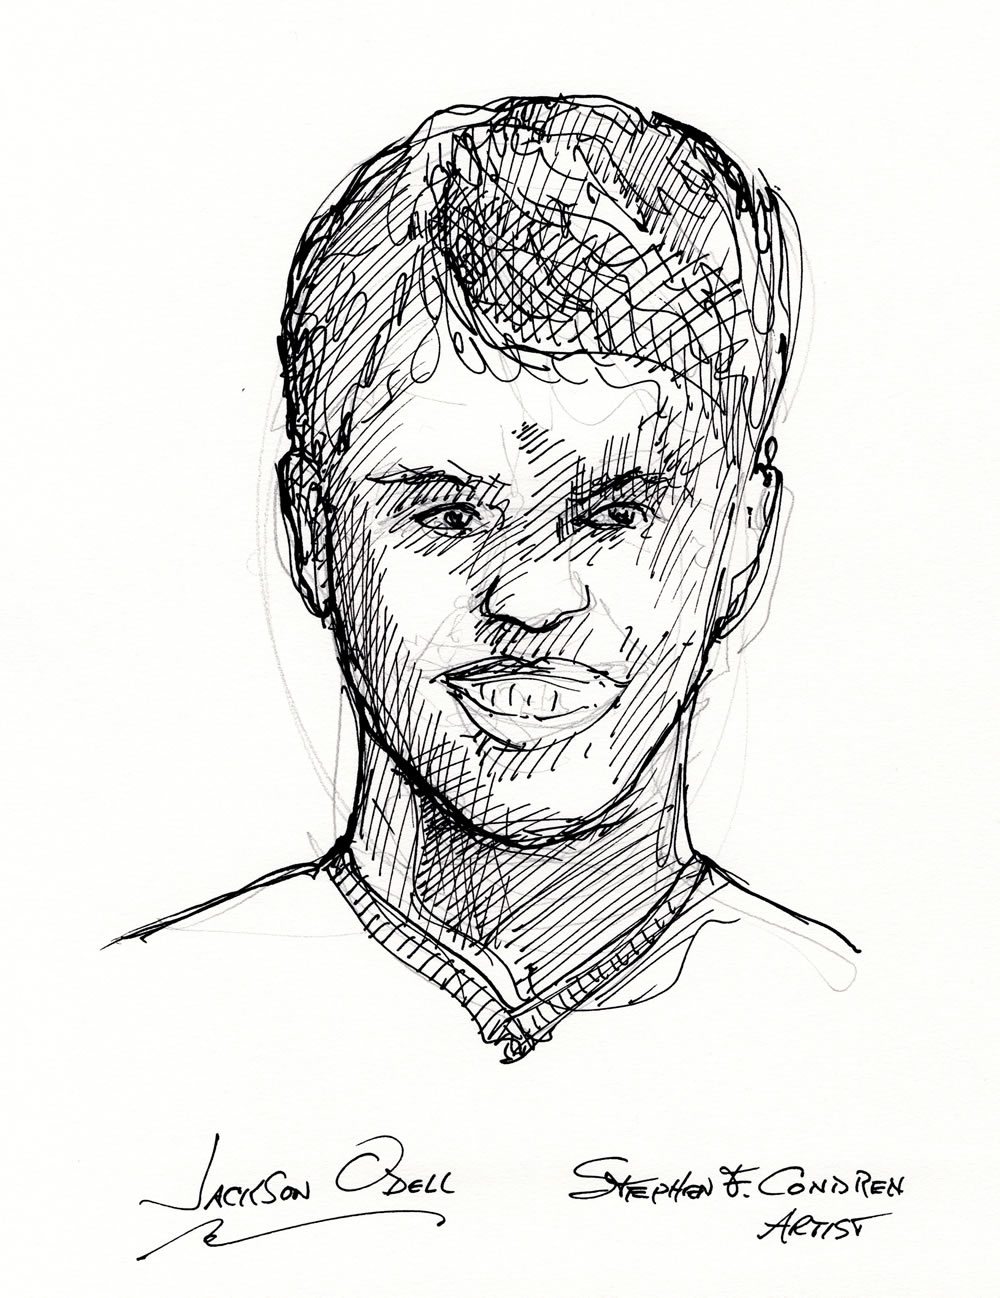 Jackson Odell celebrity art pen & ink drawing